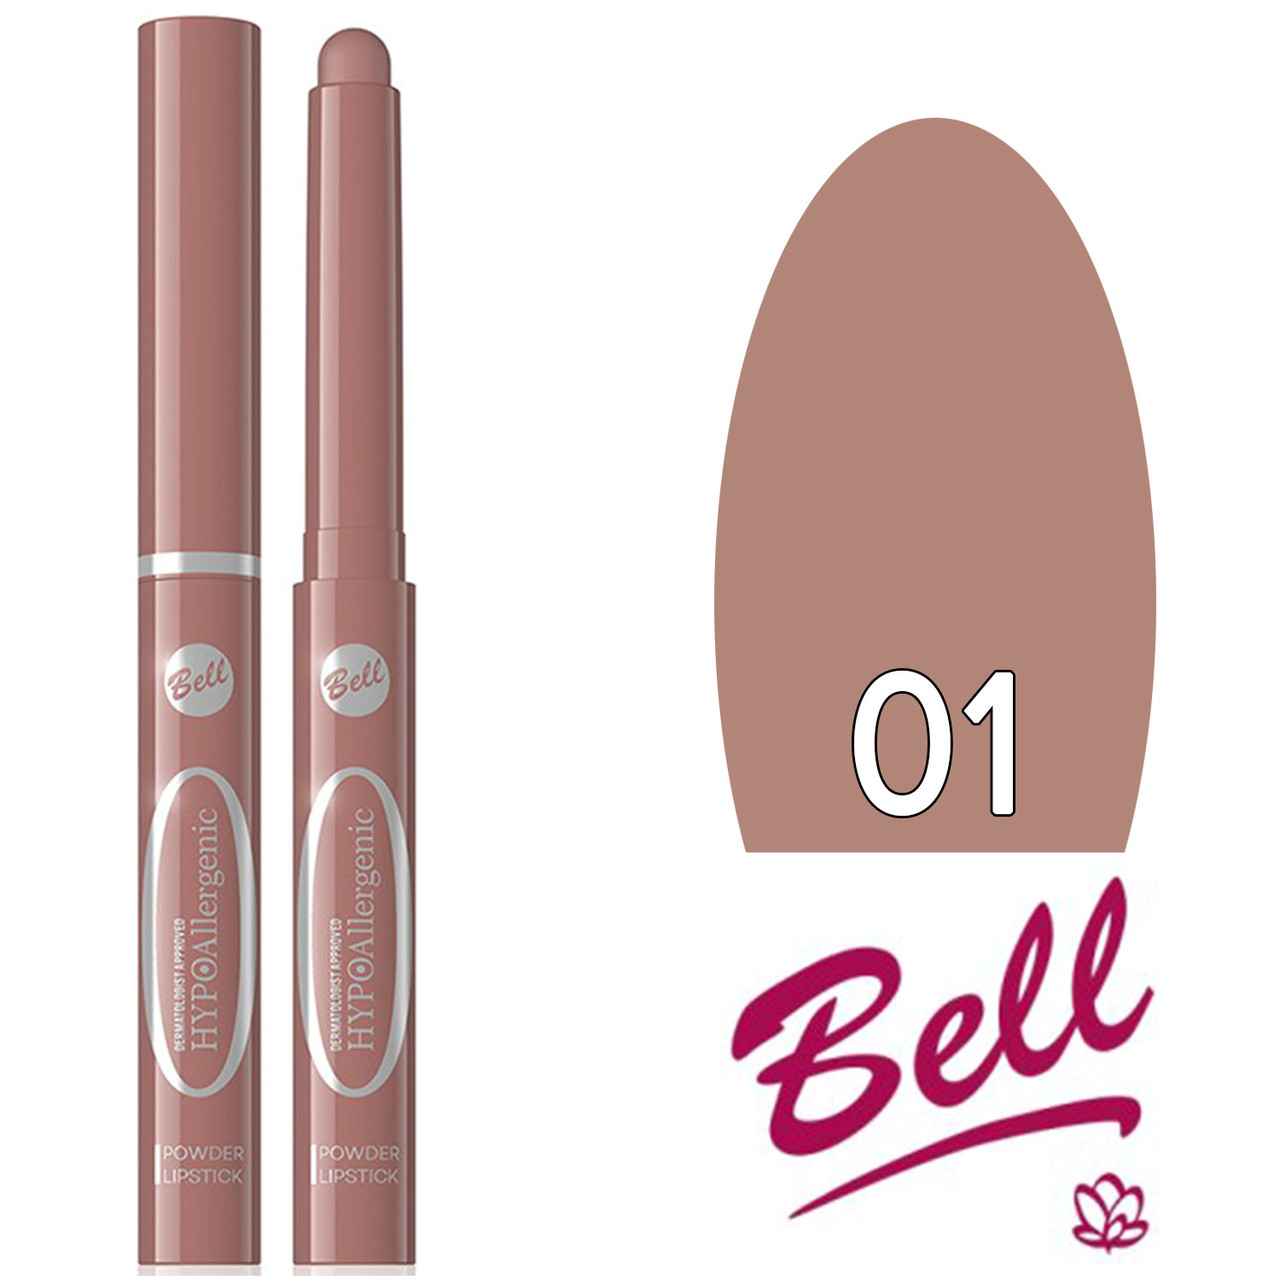 Bell HypoAllergenic - Губная помада Powder Lipstick Тон 01 natural матовая